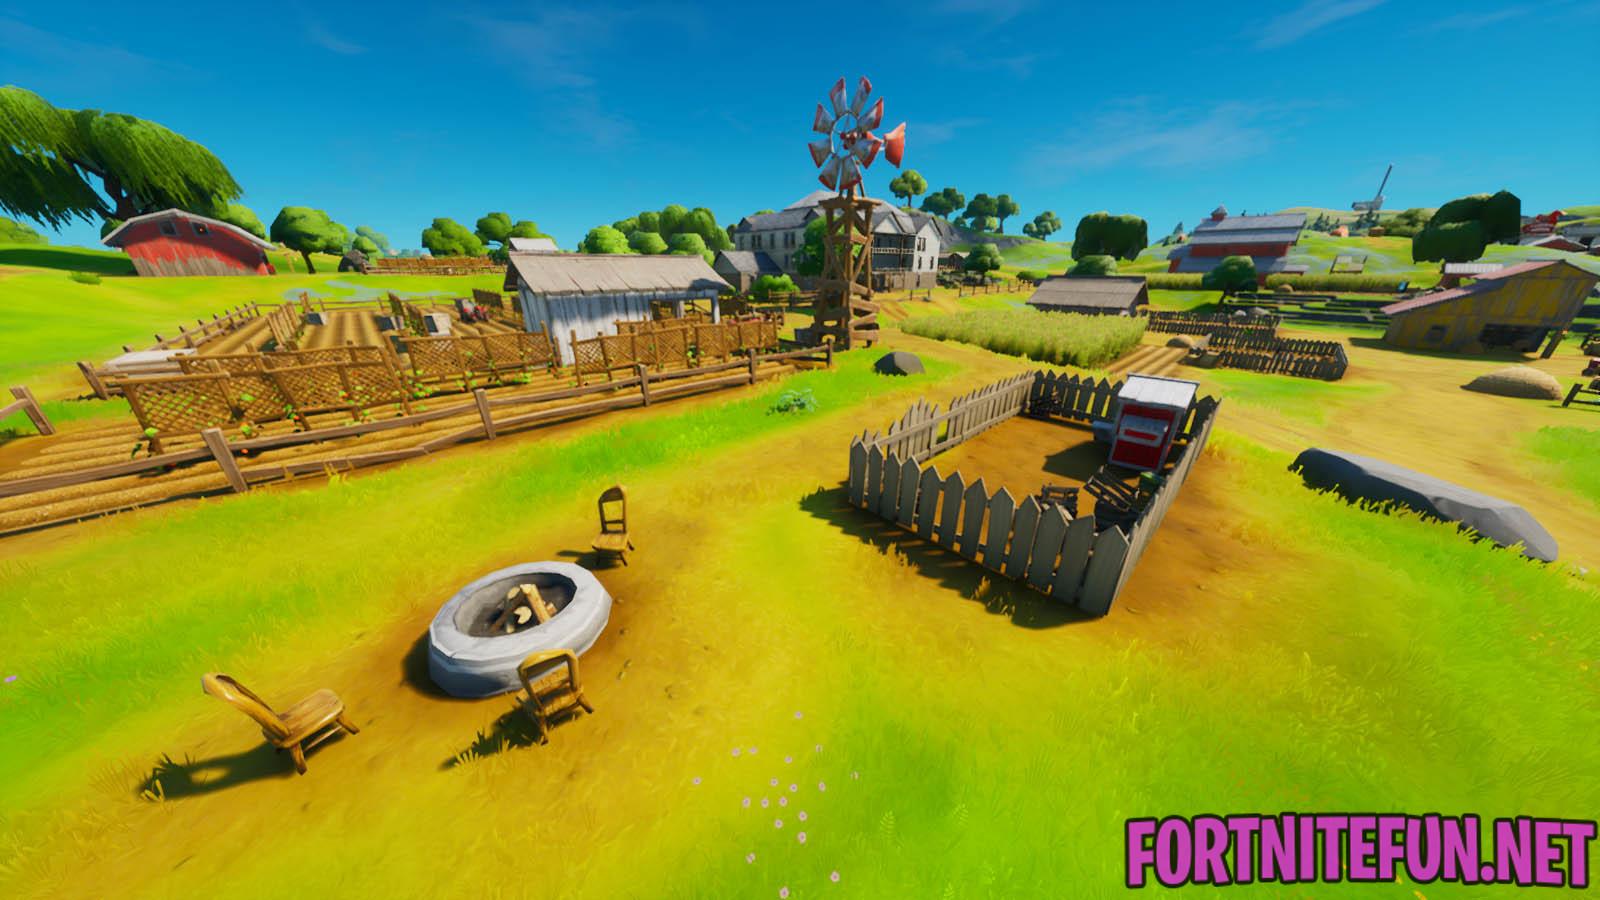 Frenzy Farm Fortnite Location Fortnite Frenzy Farm Location Fortnite Battle Royale